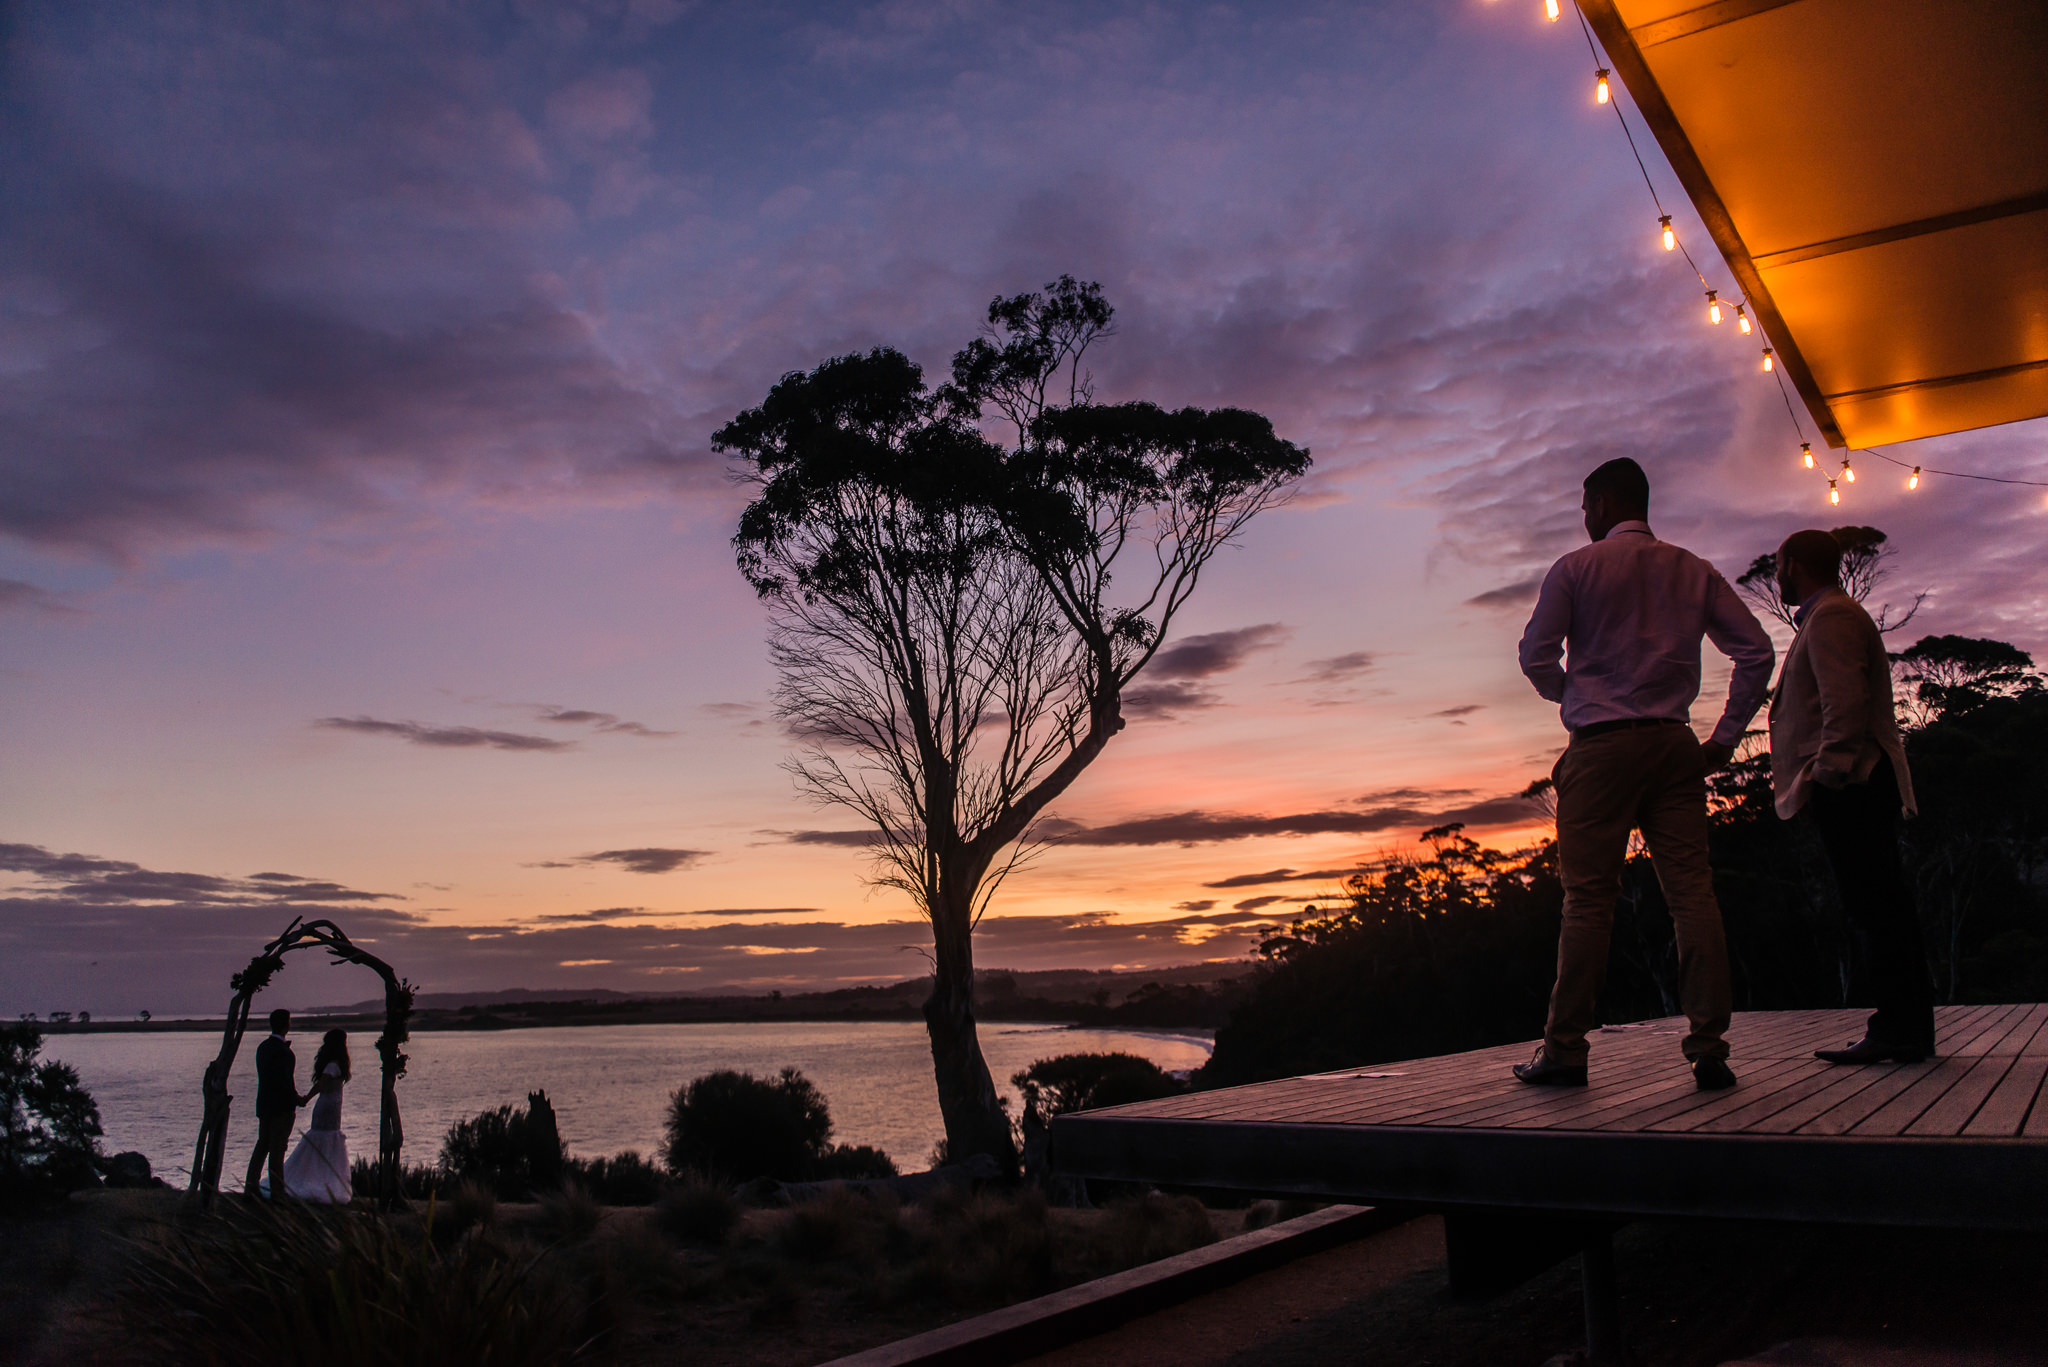 Spectacular sunset at Avalon